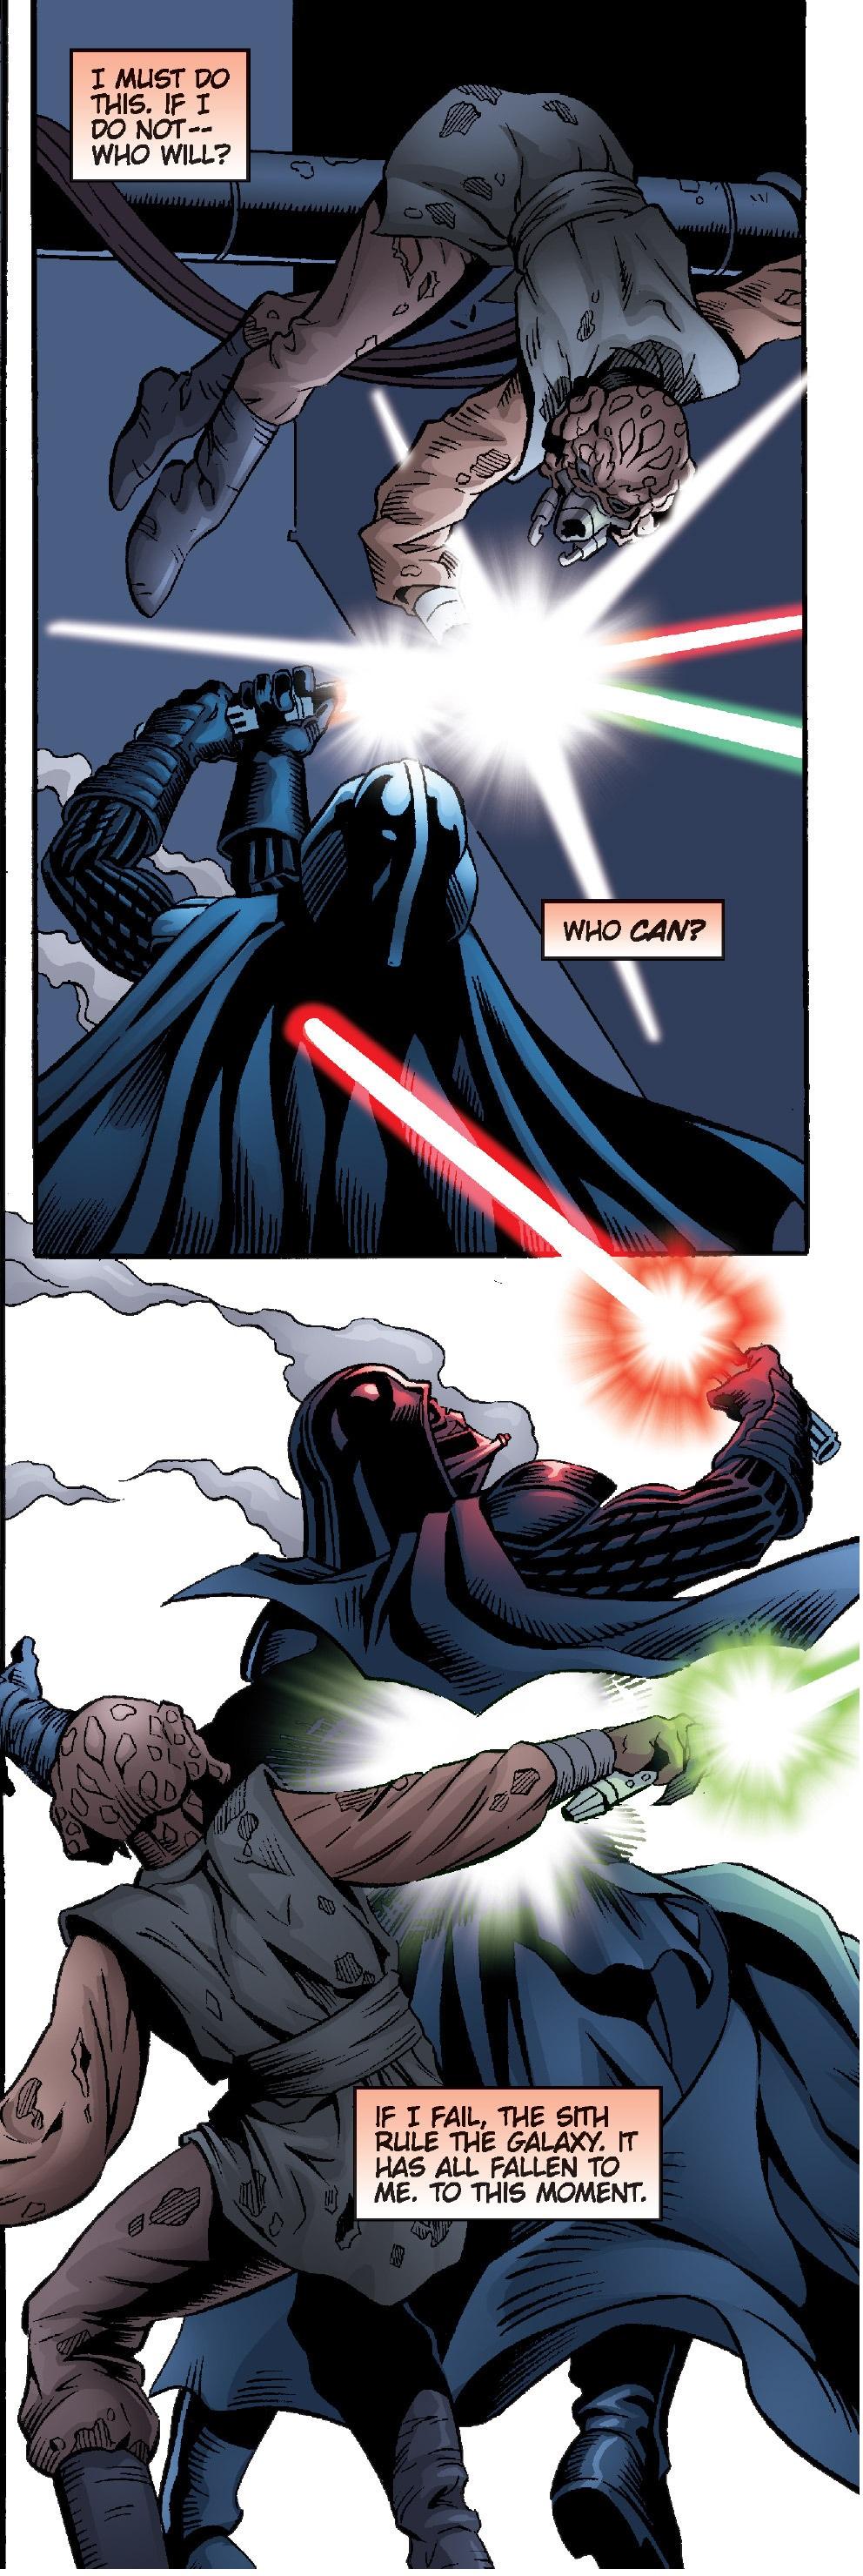 Starkiller (TFU 2) vs ROTJ Vader - Page 3 Sha_ko10